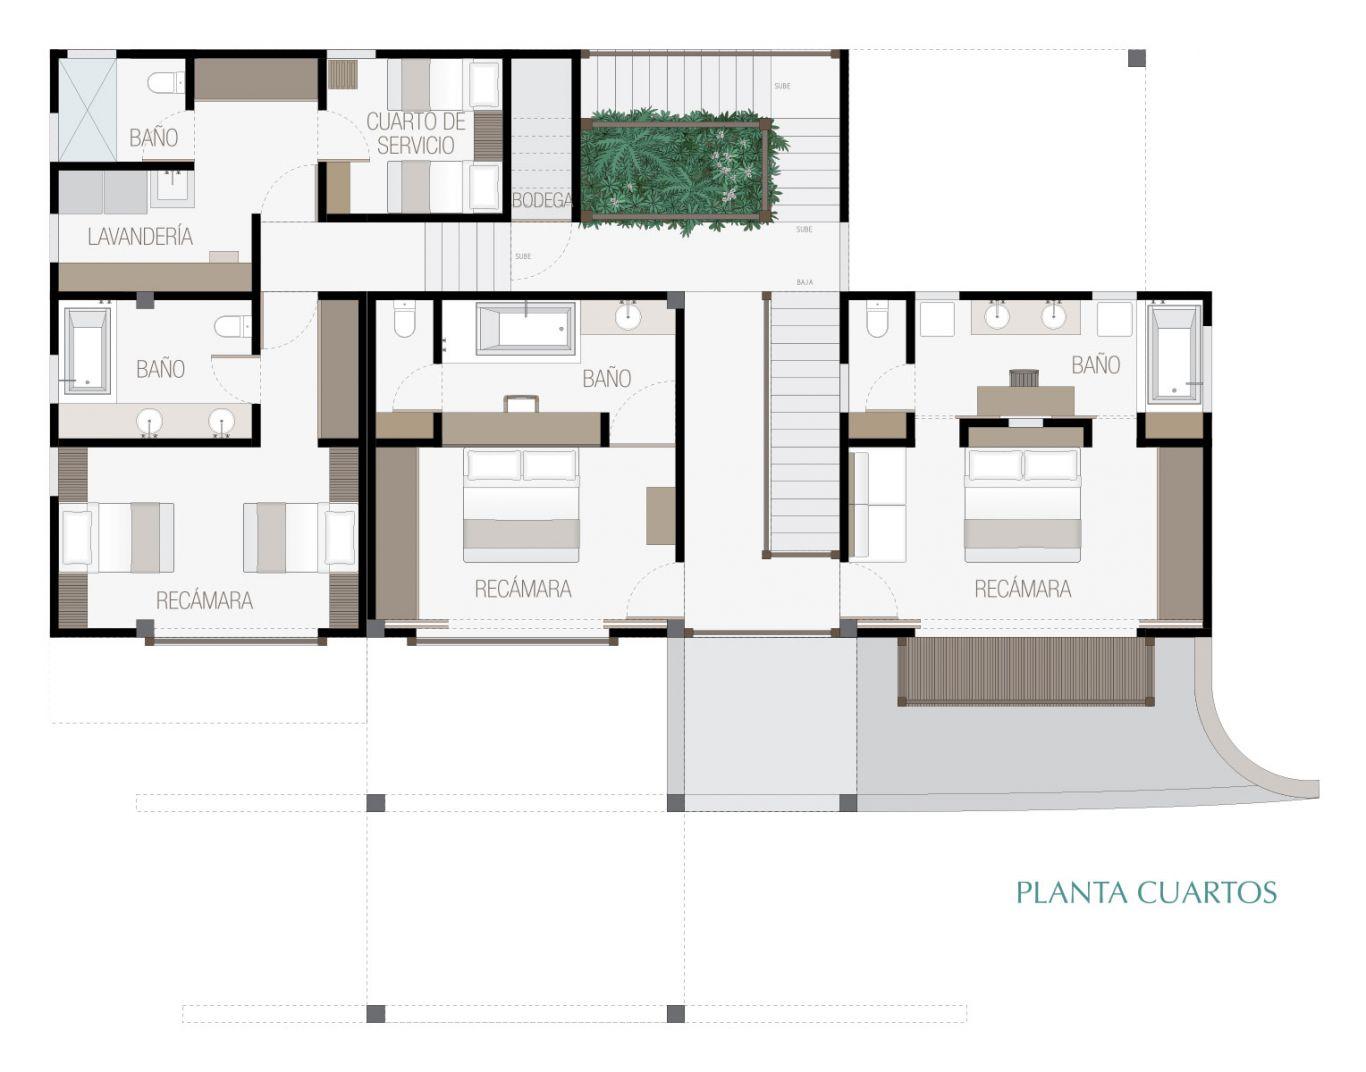 Manai, id 1519068, no 3, plano de villa 7, 290